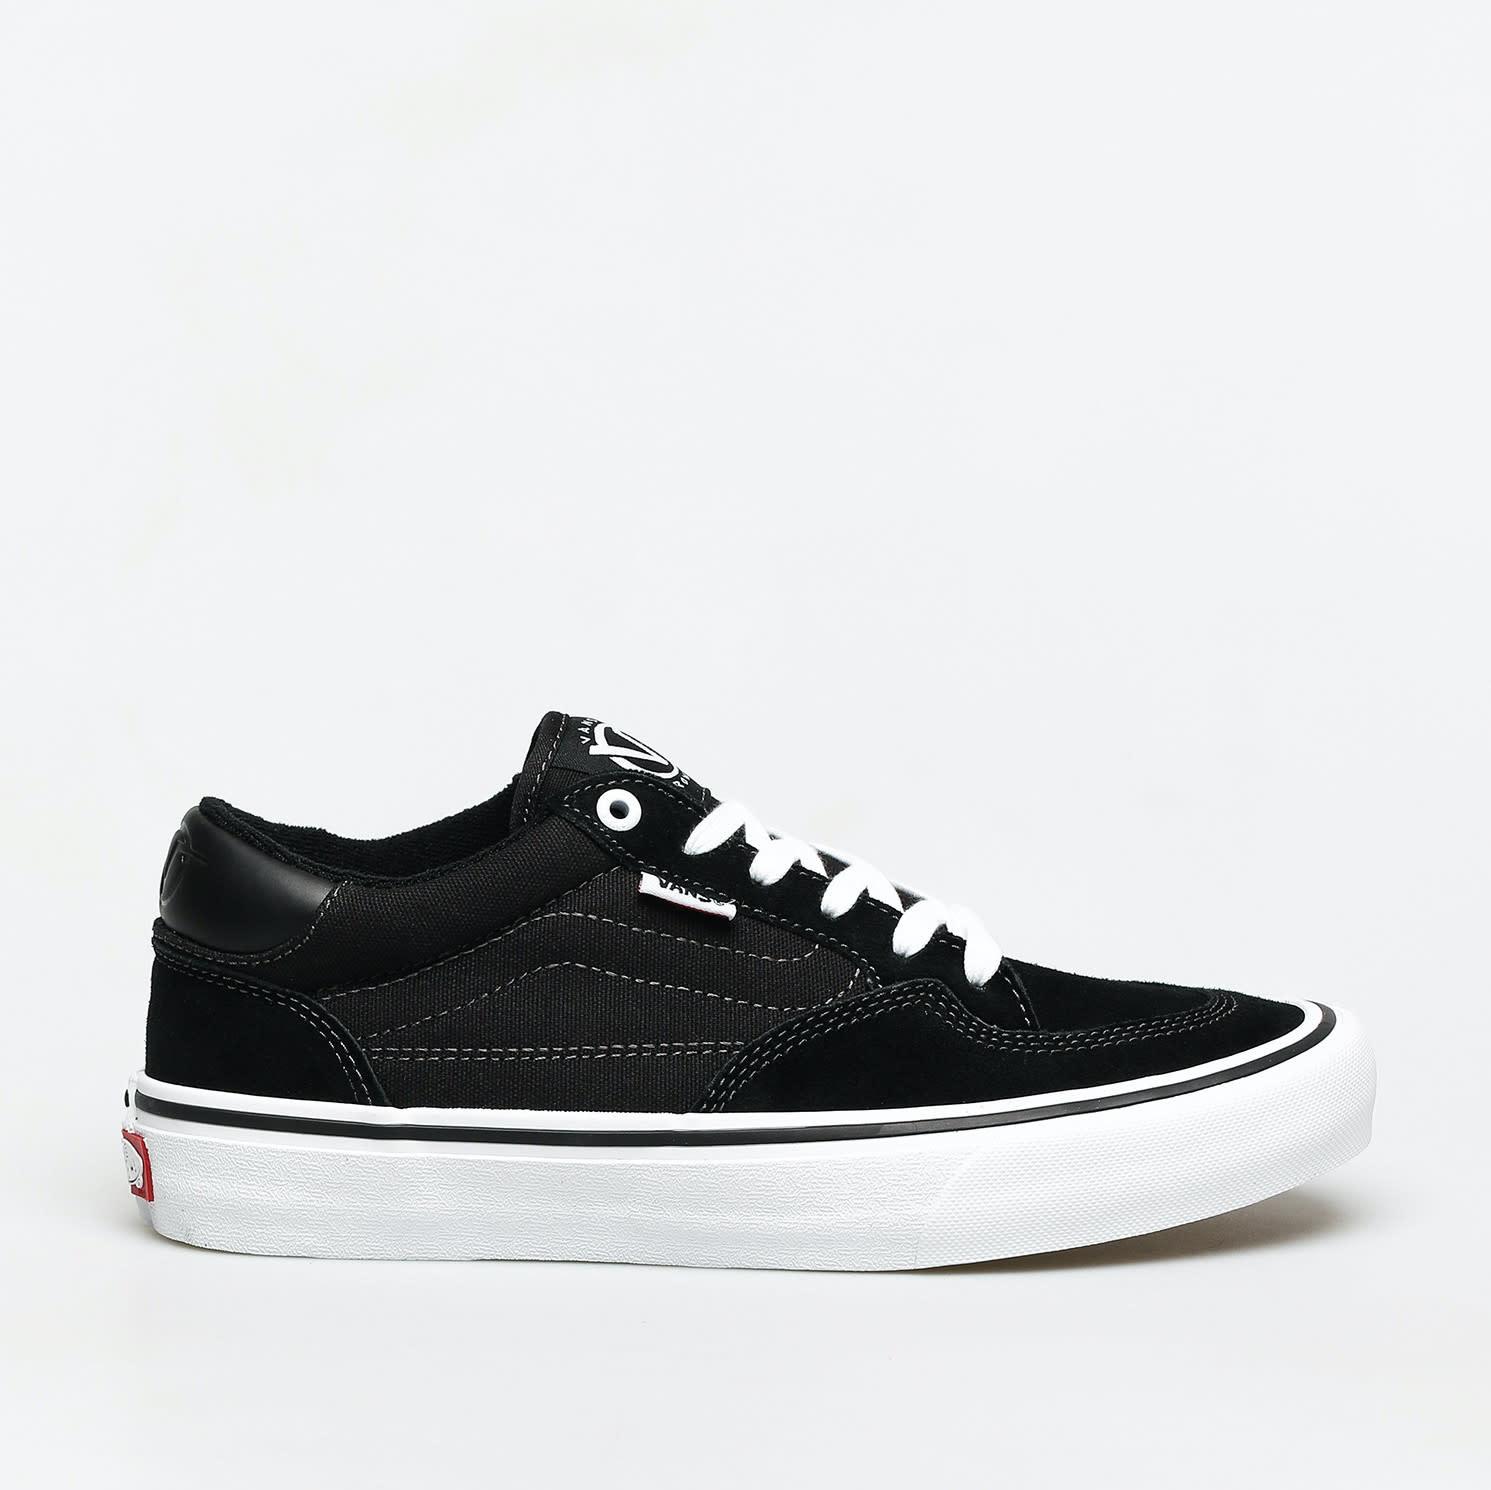 Vans Shoes Rowan Pro Black/White